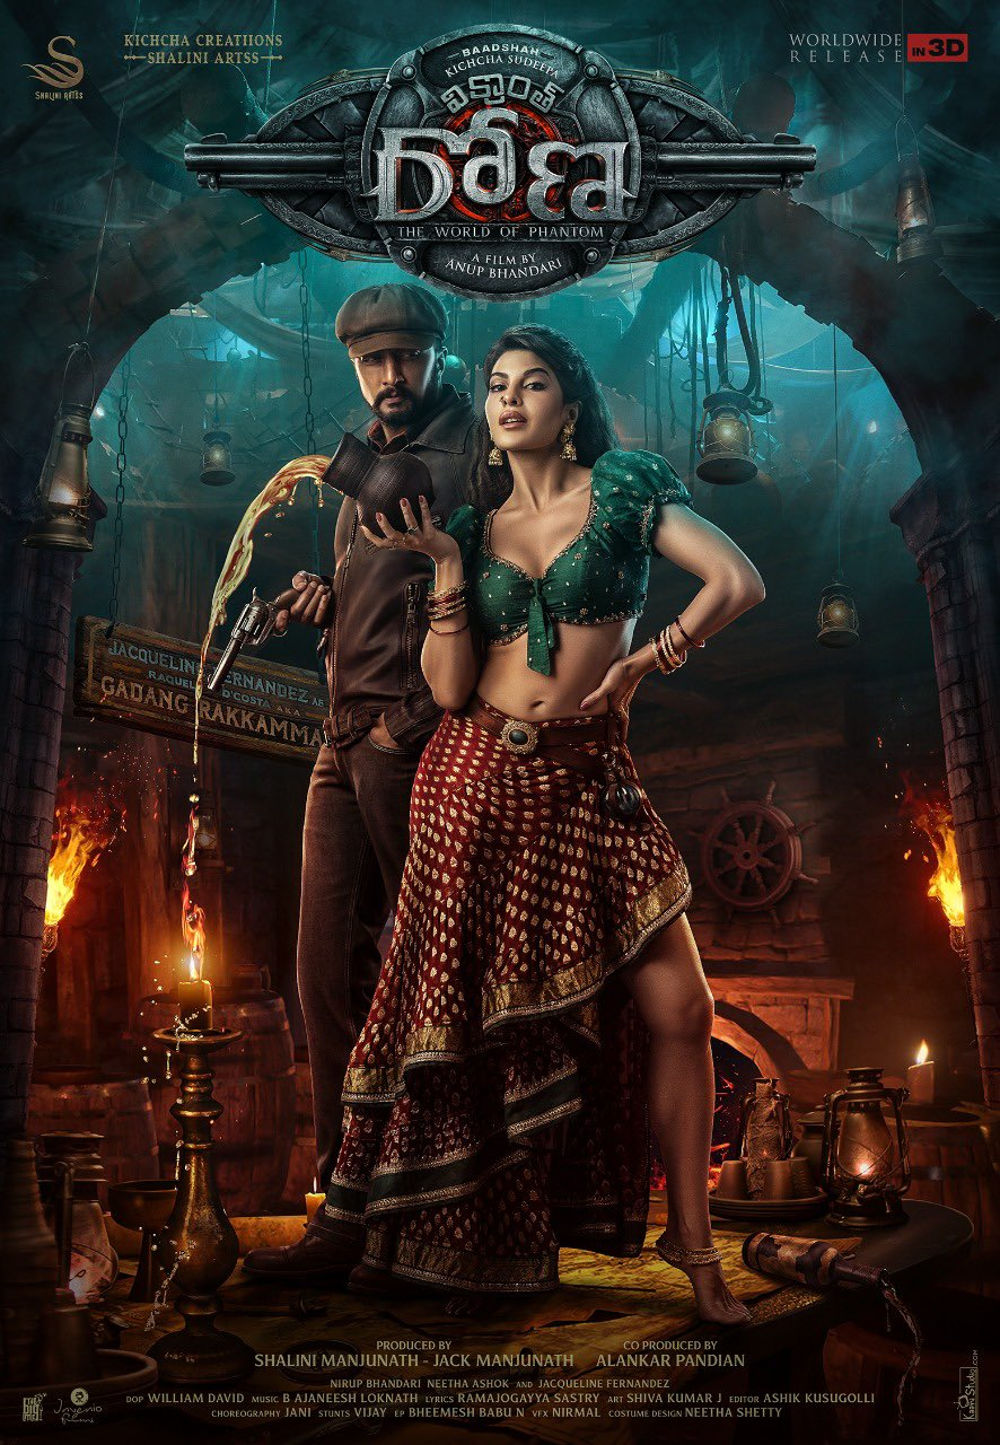 Jacqueline Fernandez Is Gadang Rakkamma in Kichcha Sudeepa starrer Vikrant Rona